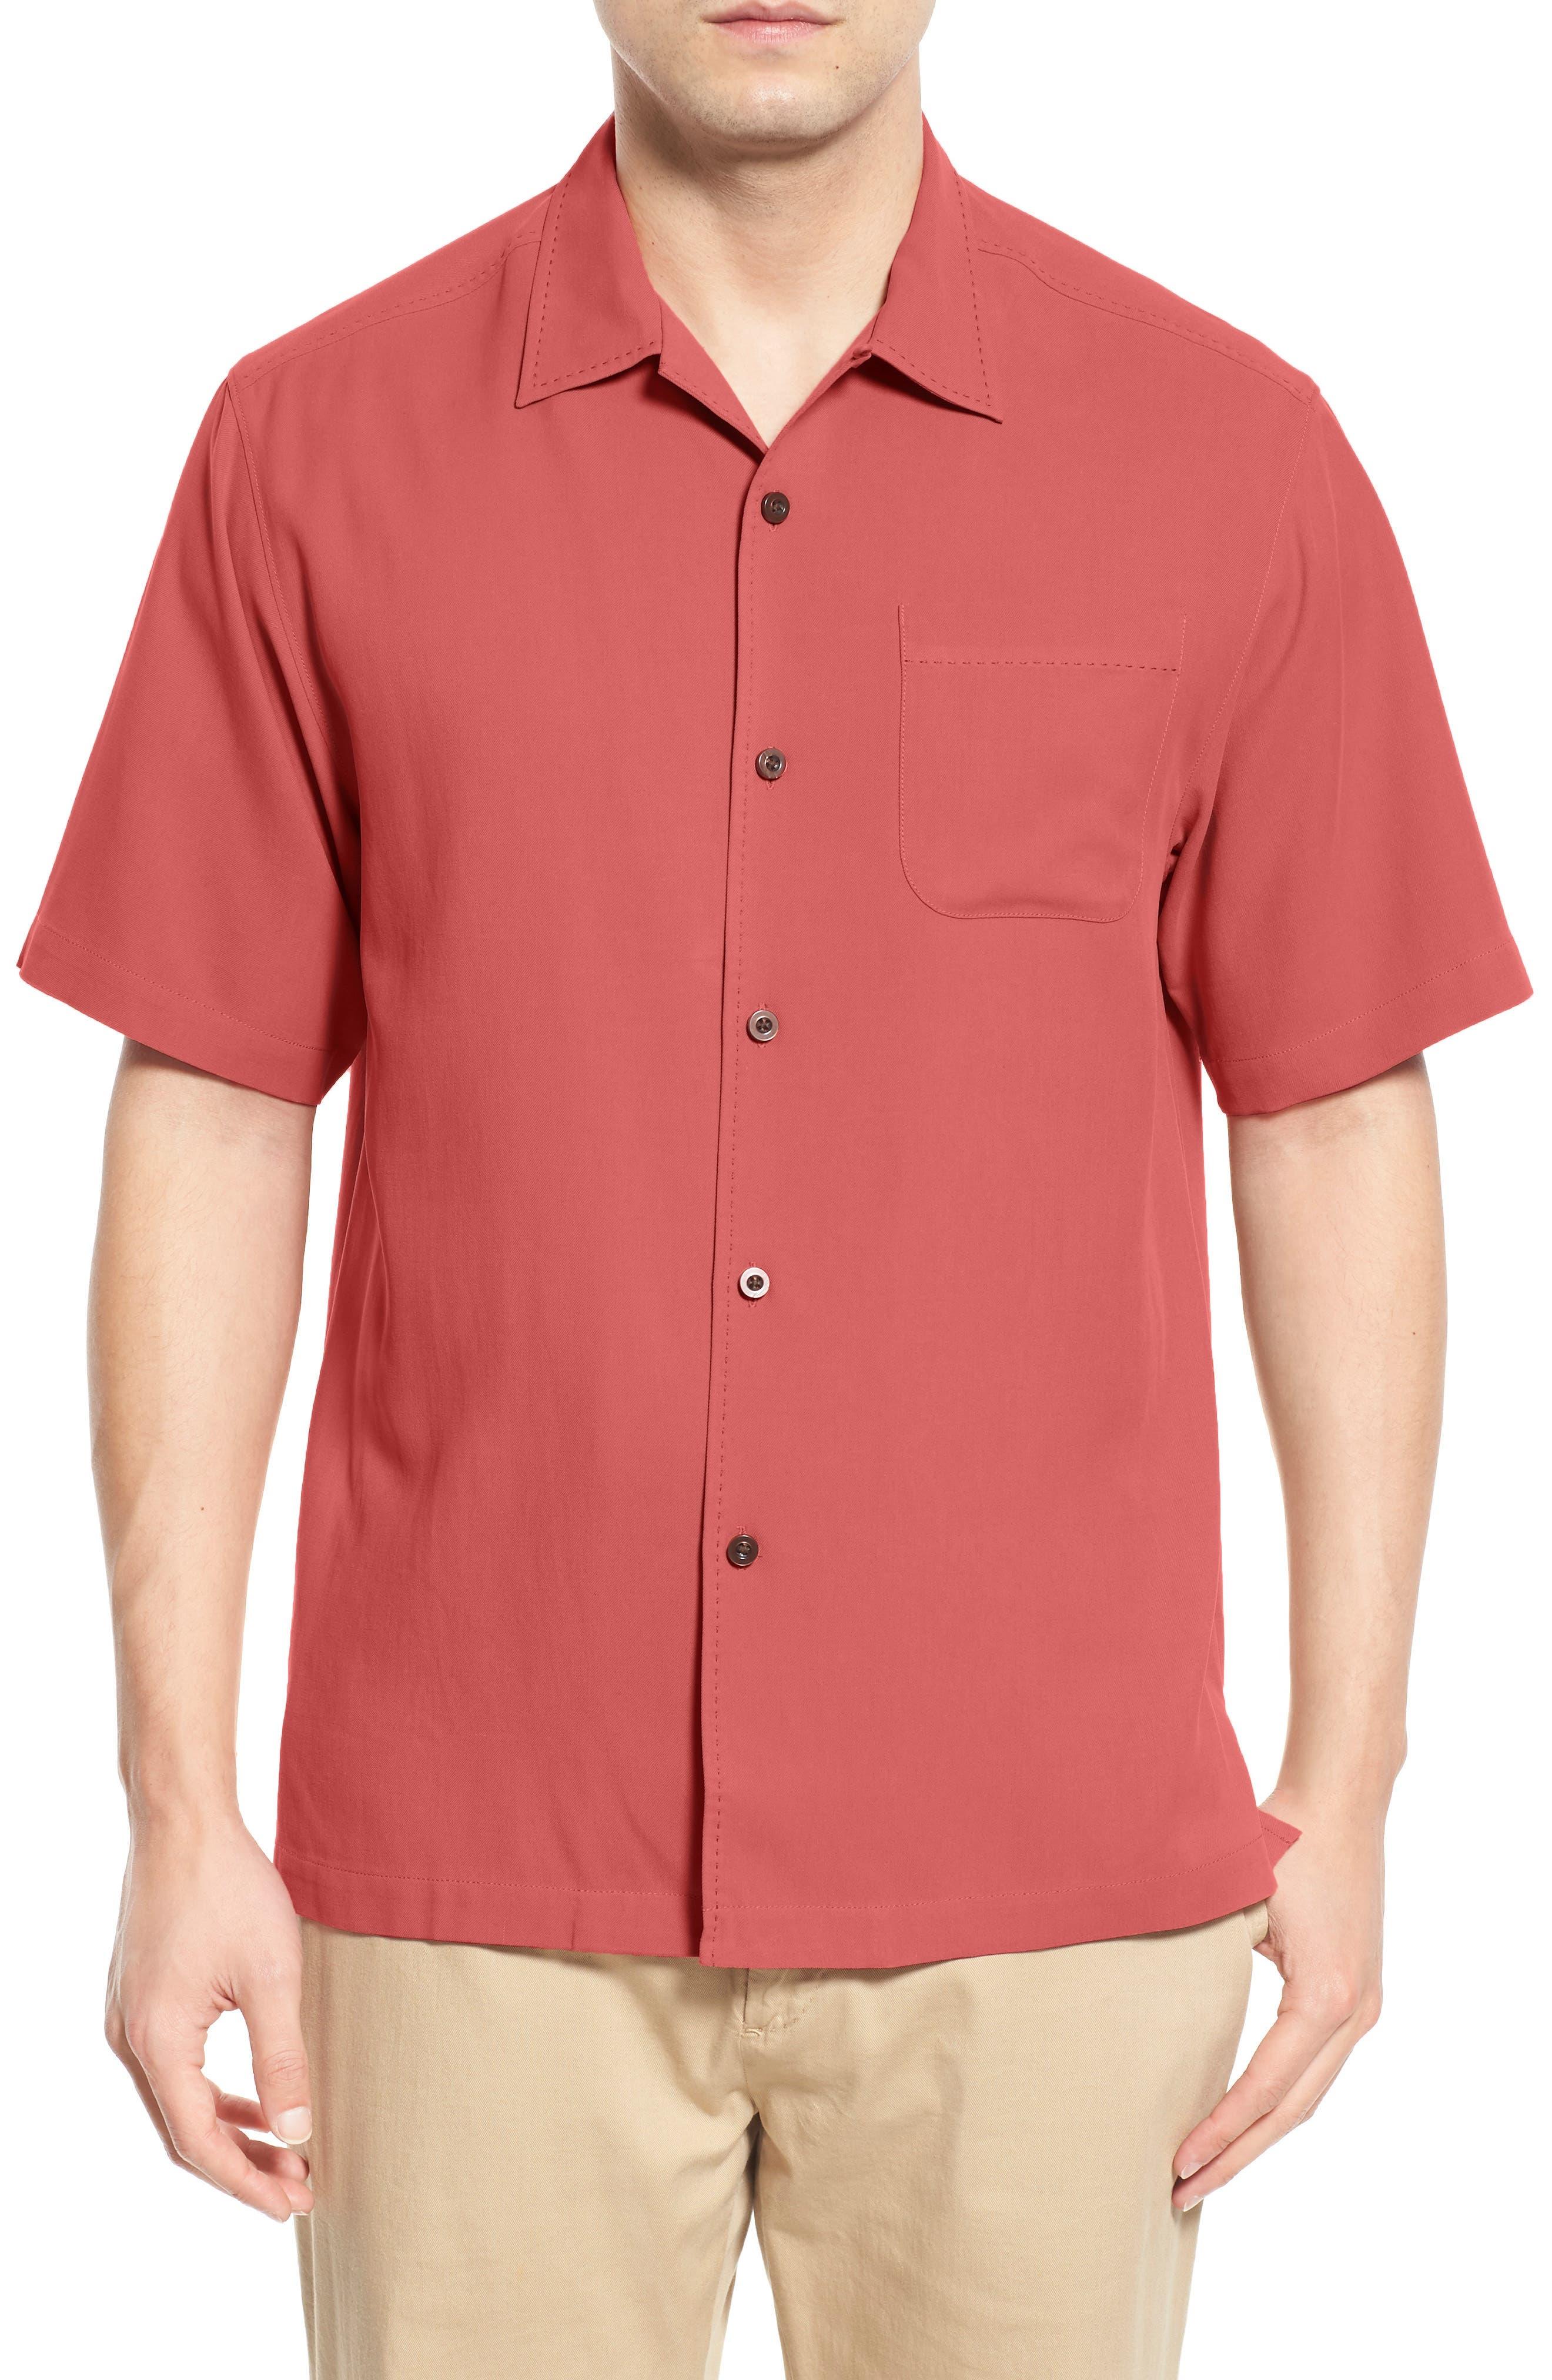 Tommy Bahama 'Catalina Twill' Original Fit Silk Camp Shirt